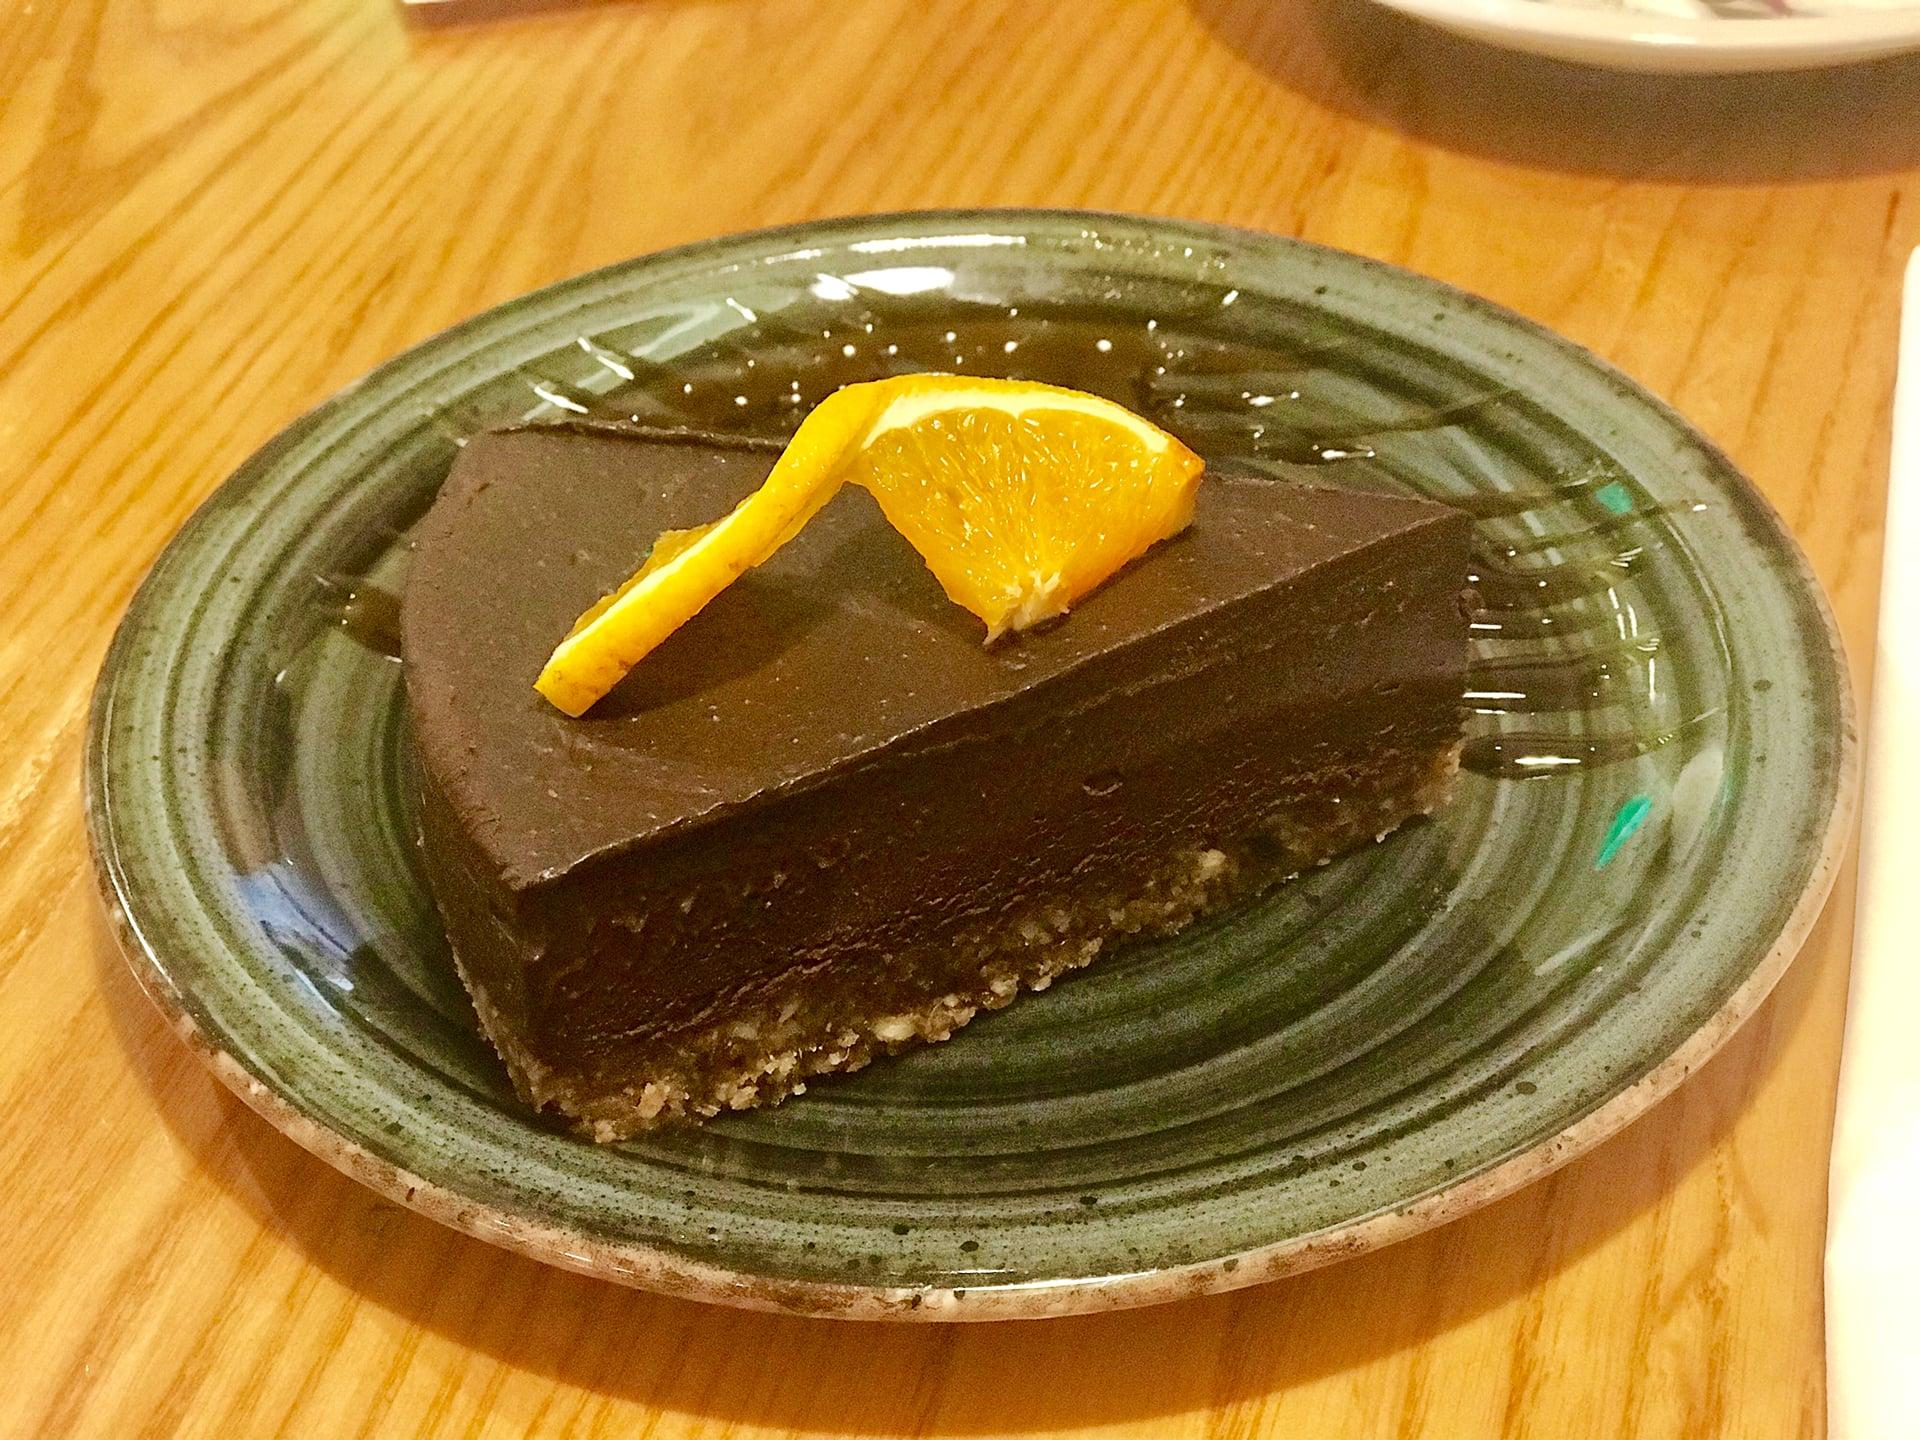 Athen Restaurant und Cafe Tipps vegan: Avocado Cafe;